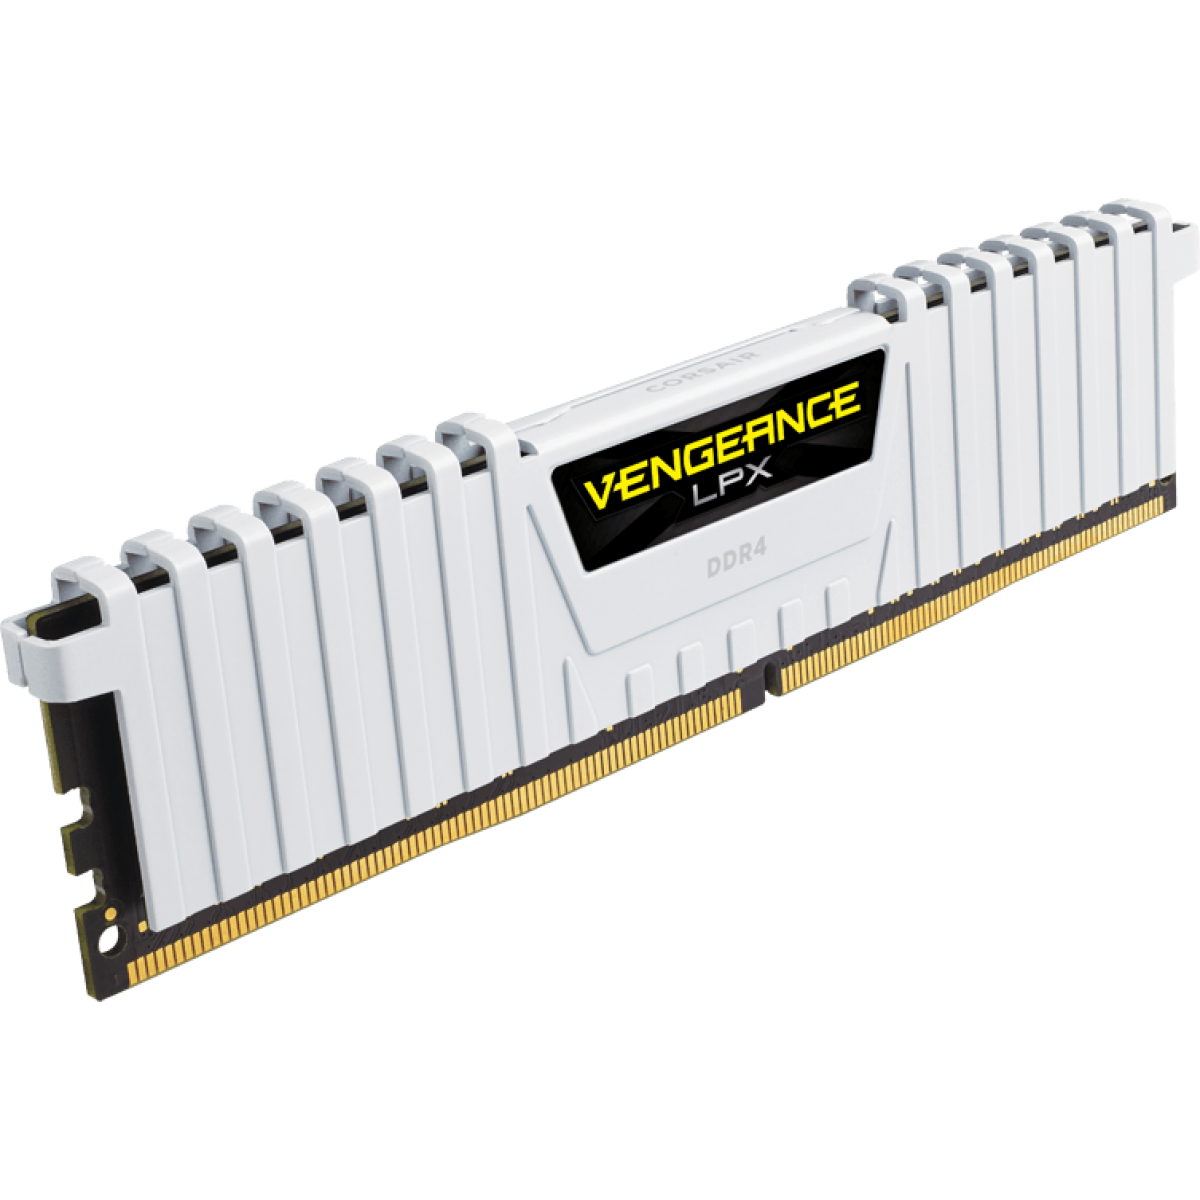 Memória DDR4 Corsair Vengeance LPX, 16GB (2x8GB) 3000MHz, White, CMK16GX4M2B3000C15W